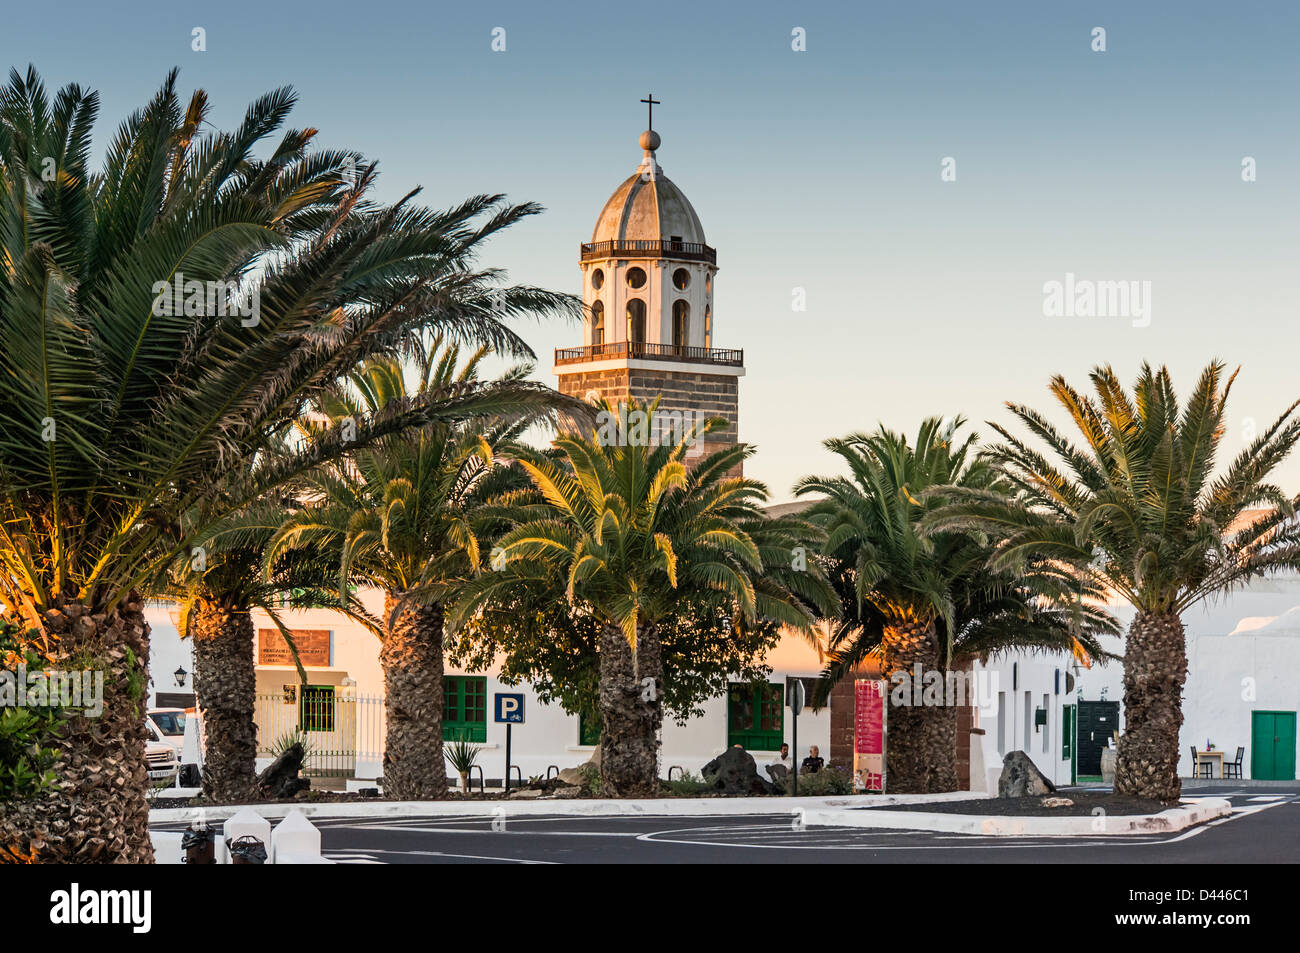 Nuestra Señora de Guadalupe Kirche, Teguise, Lanzarote, Kanarische Inseln, Spanien Stockbild